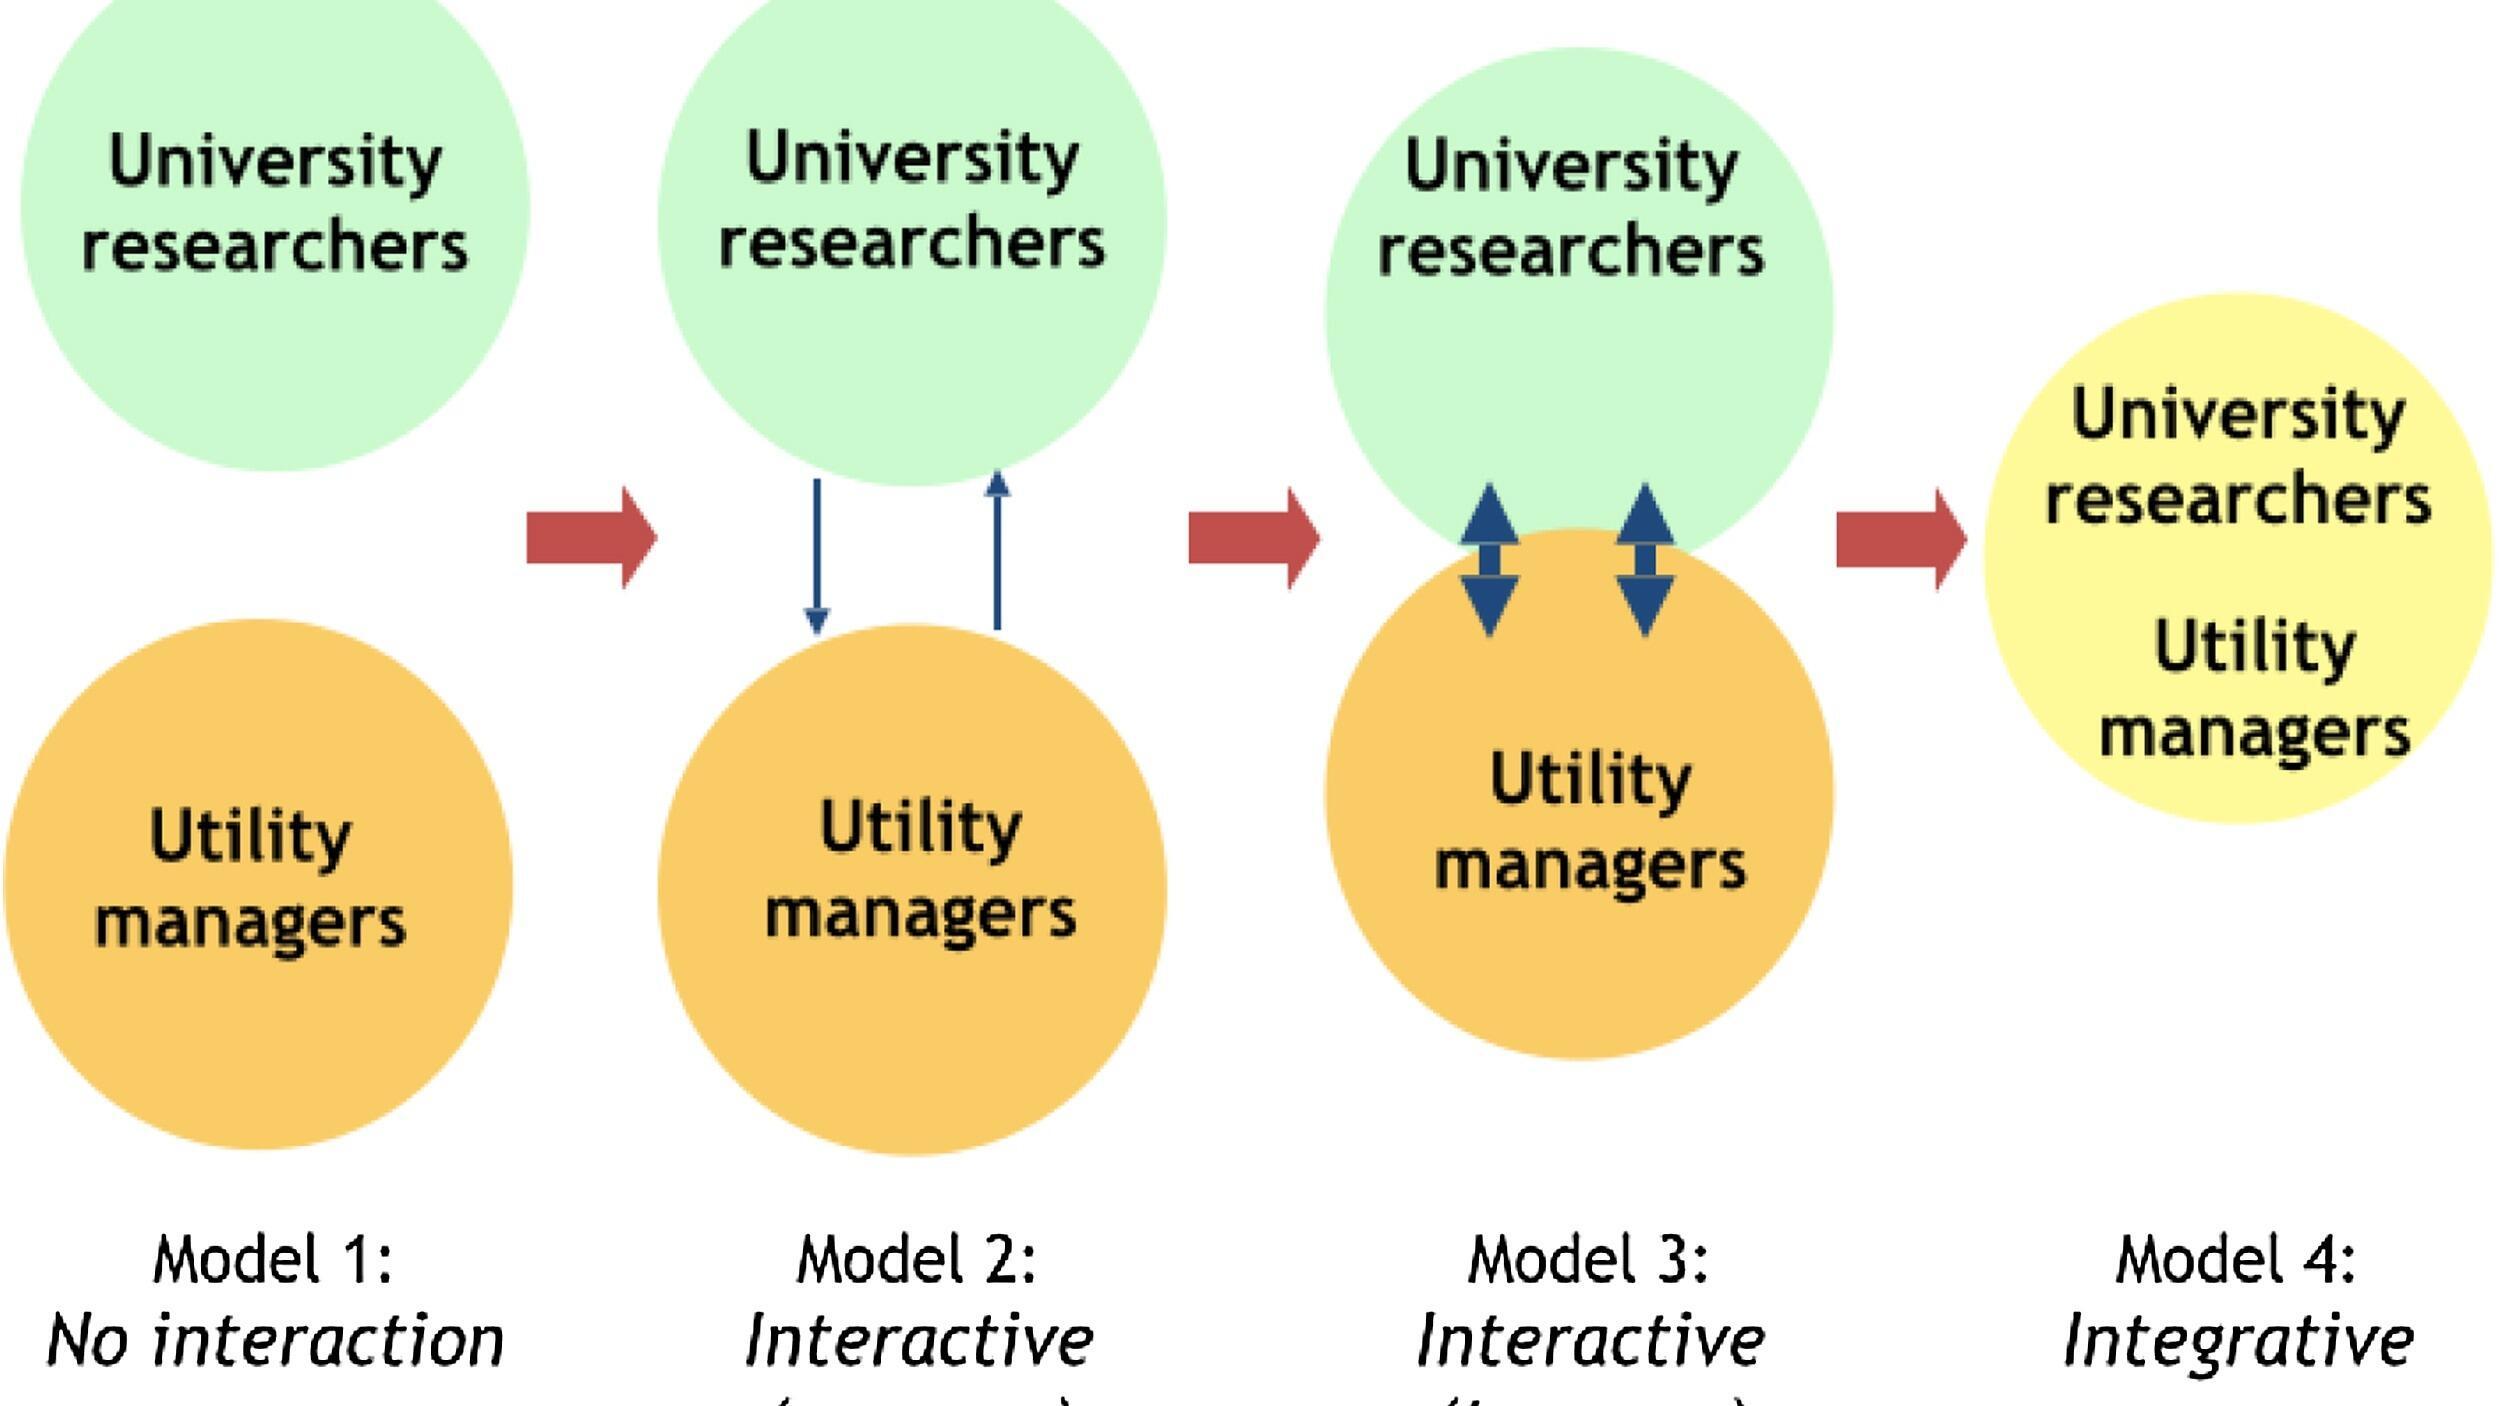 Models of university-utility collaboration.